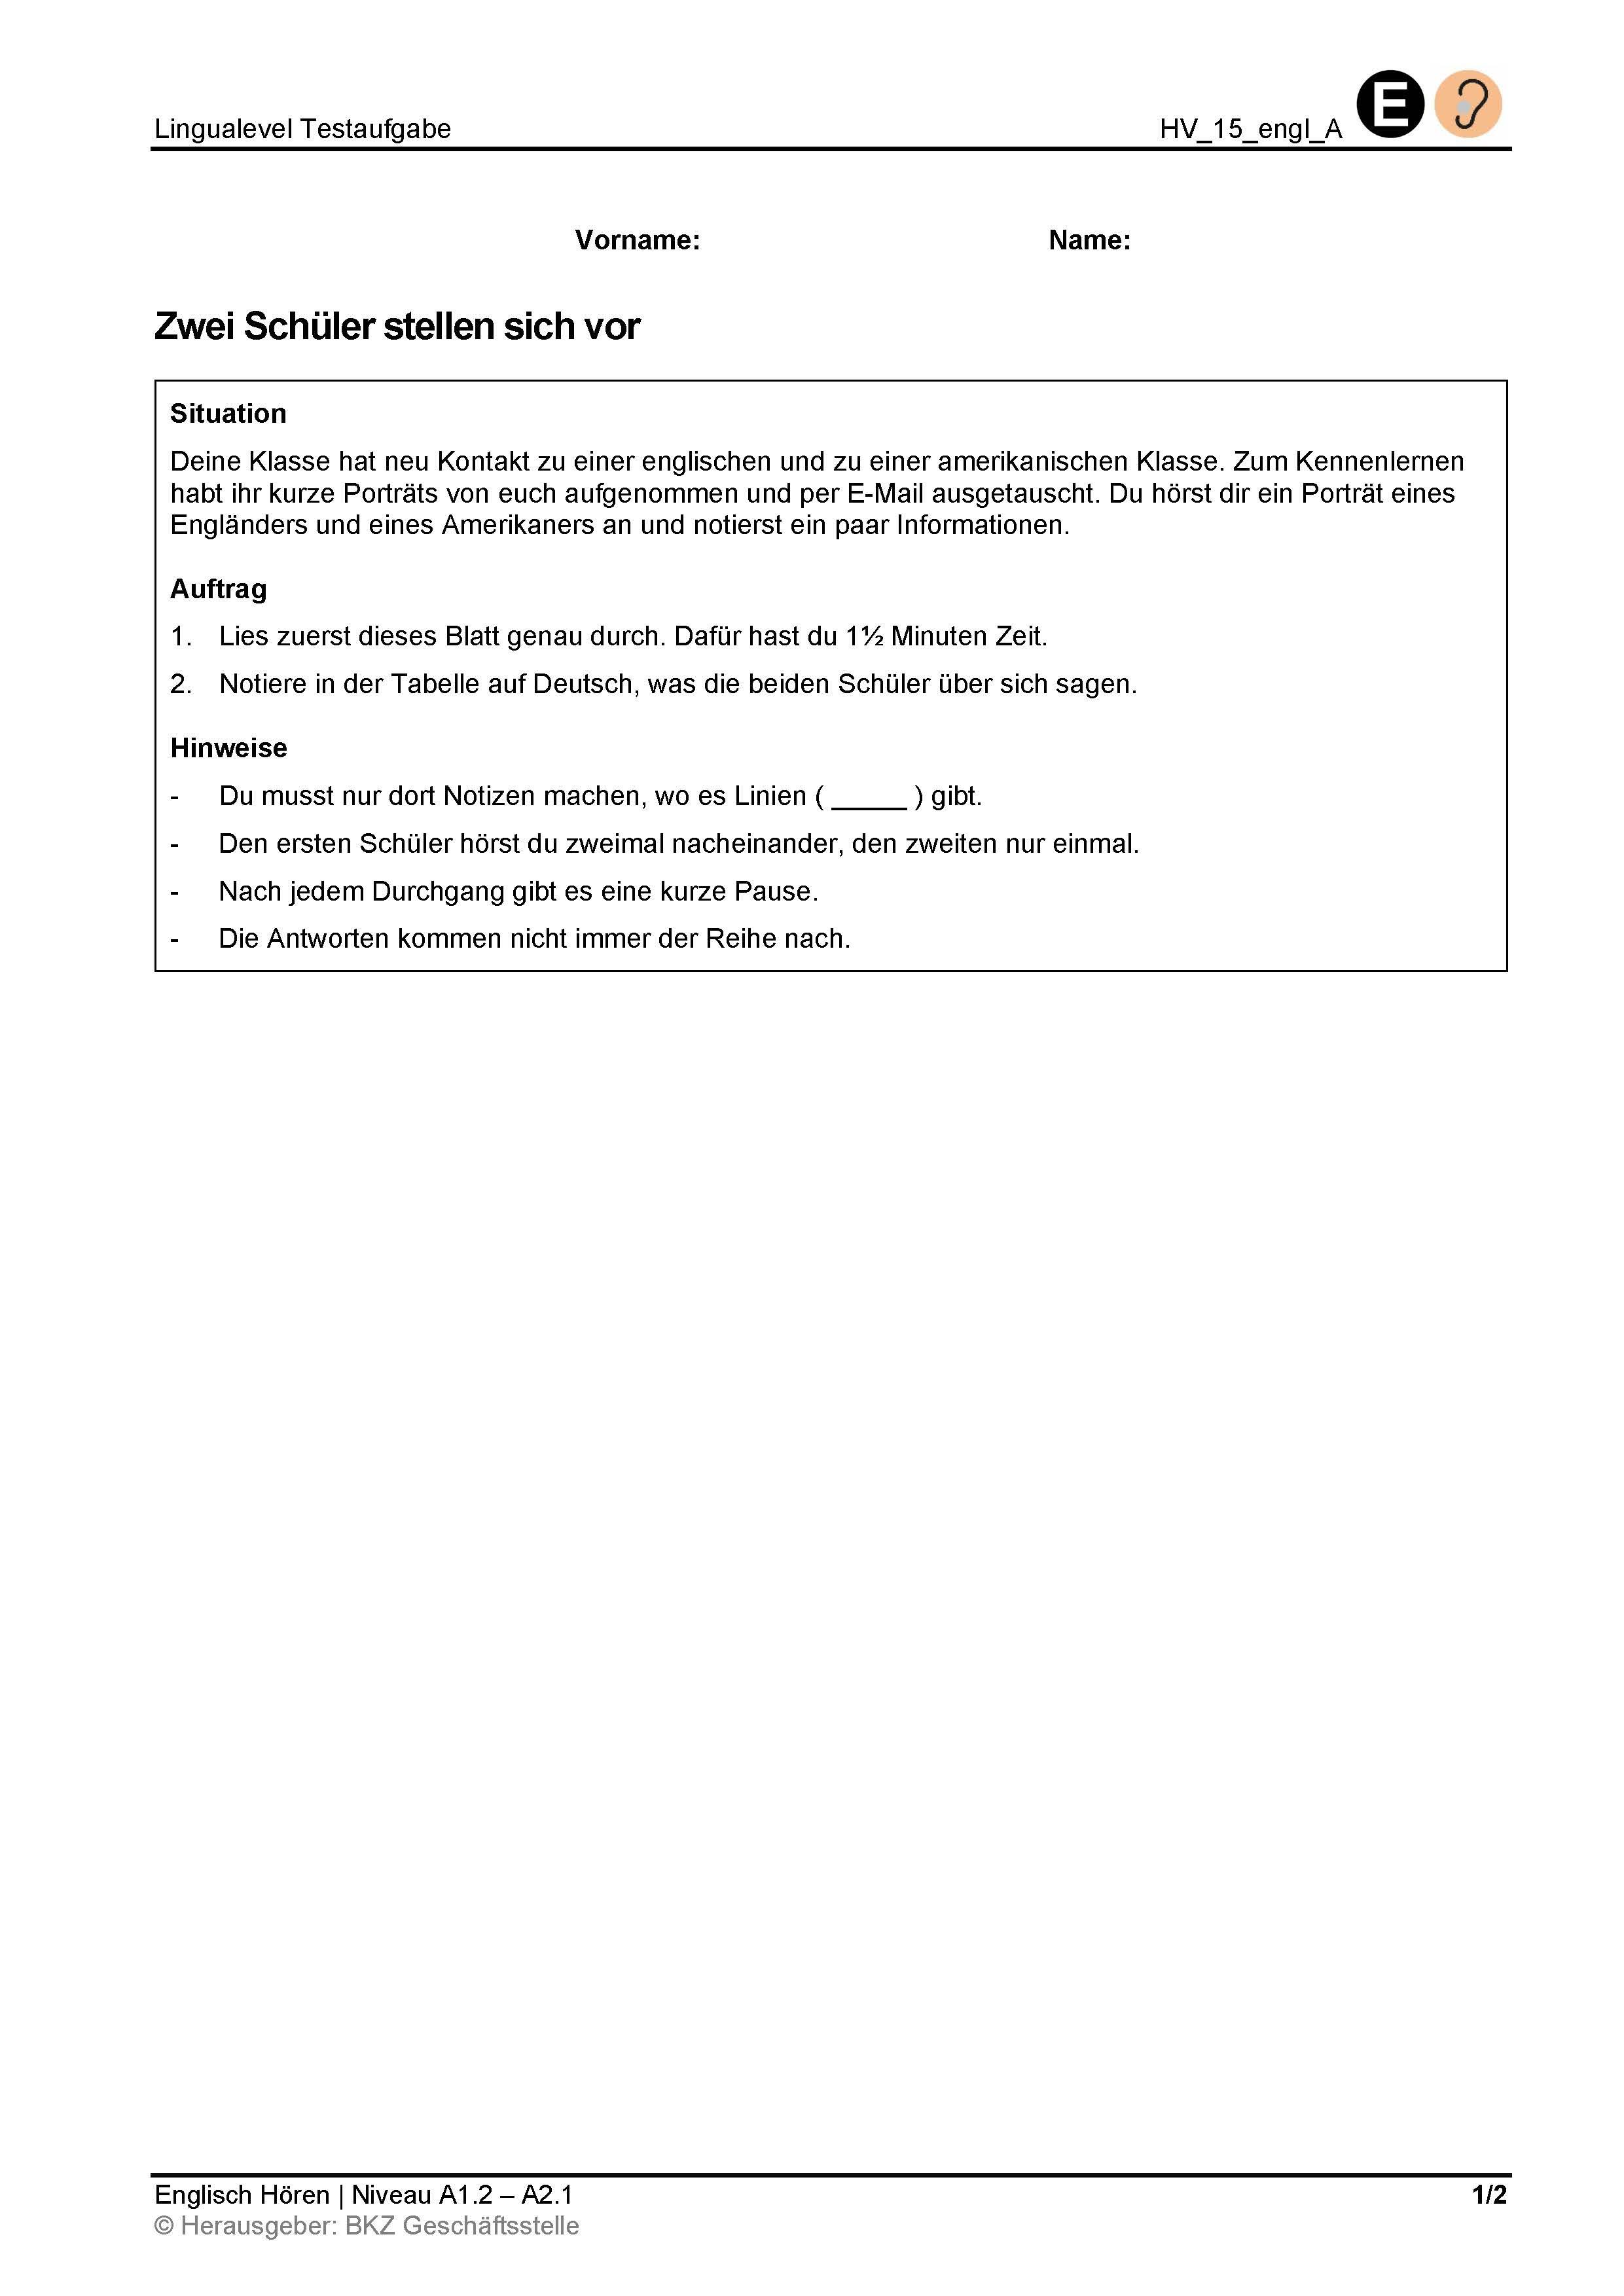 Preview image for LOM object Zwei Schüler stellen sich vor